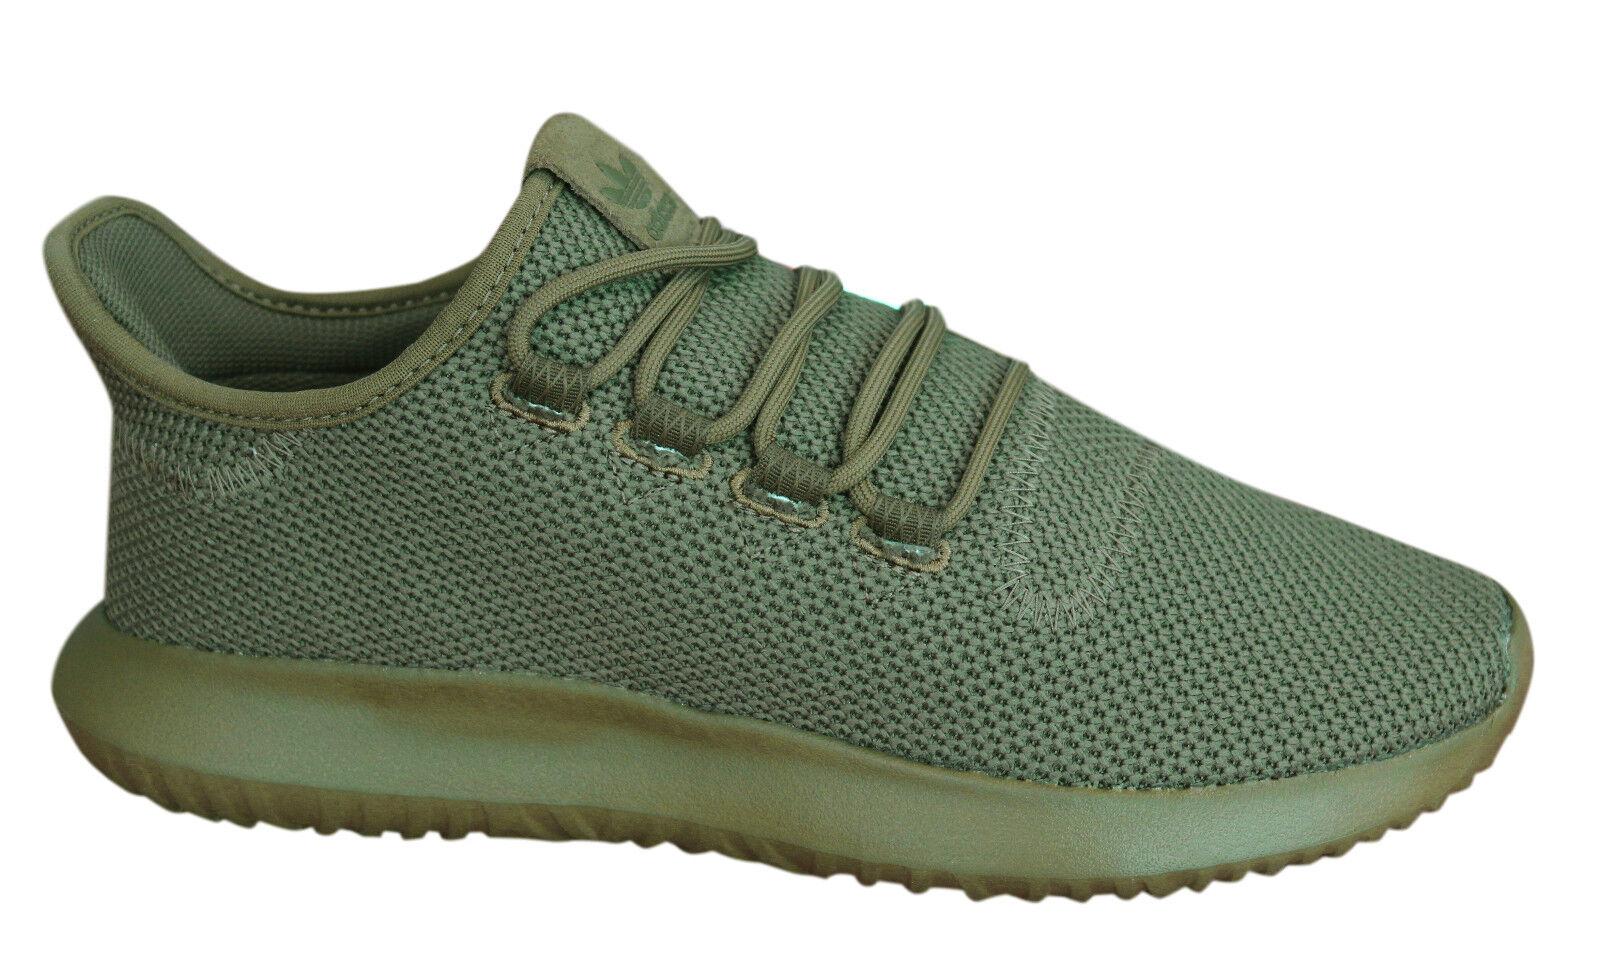 Adidas Originals Shoes Tubular Shadow Uomo Trainers Lace Up Shoes Originals Textile AQ0387 OpM10 668545